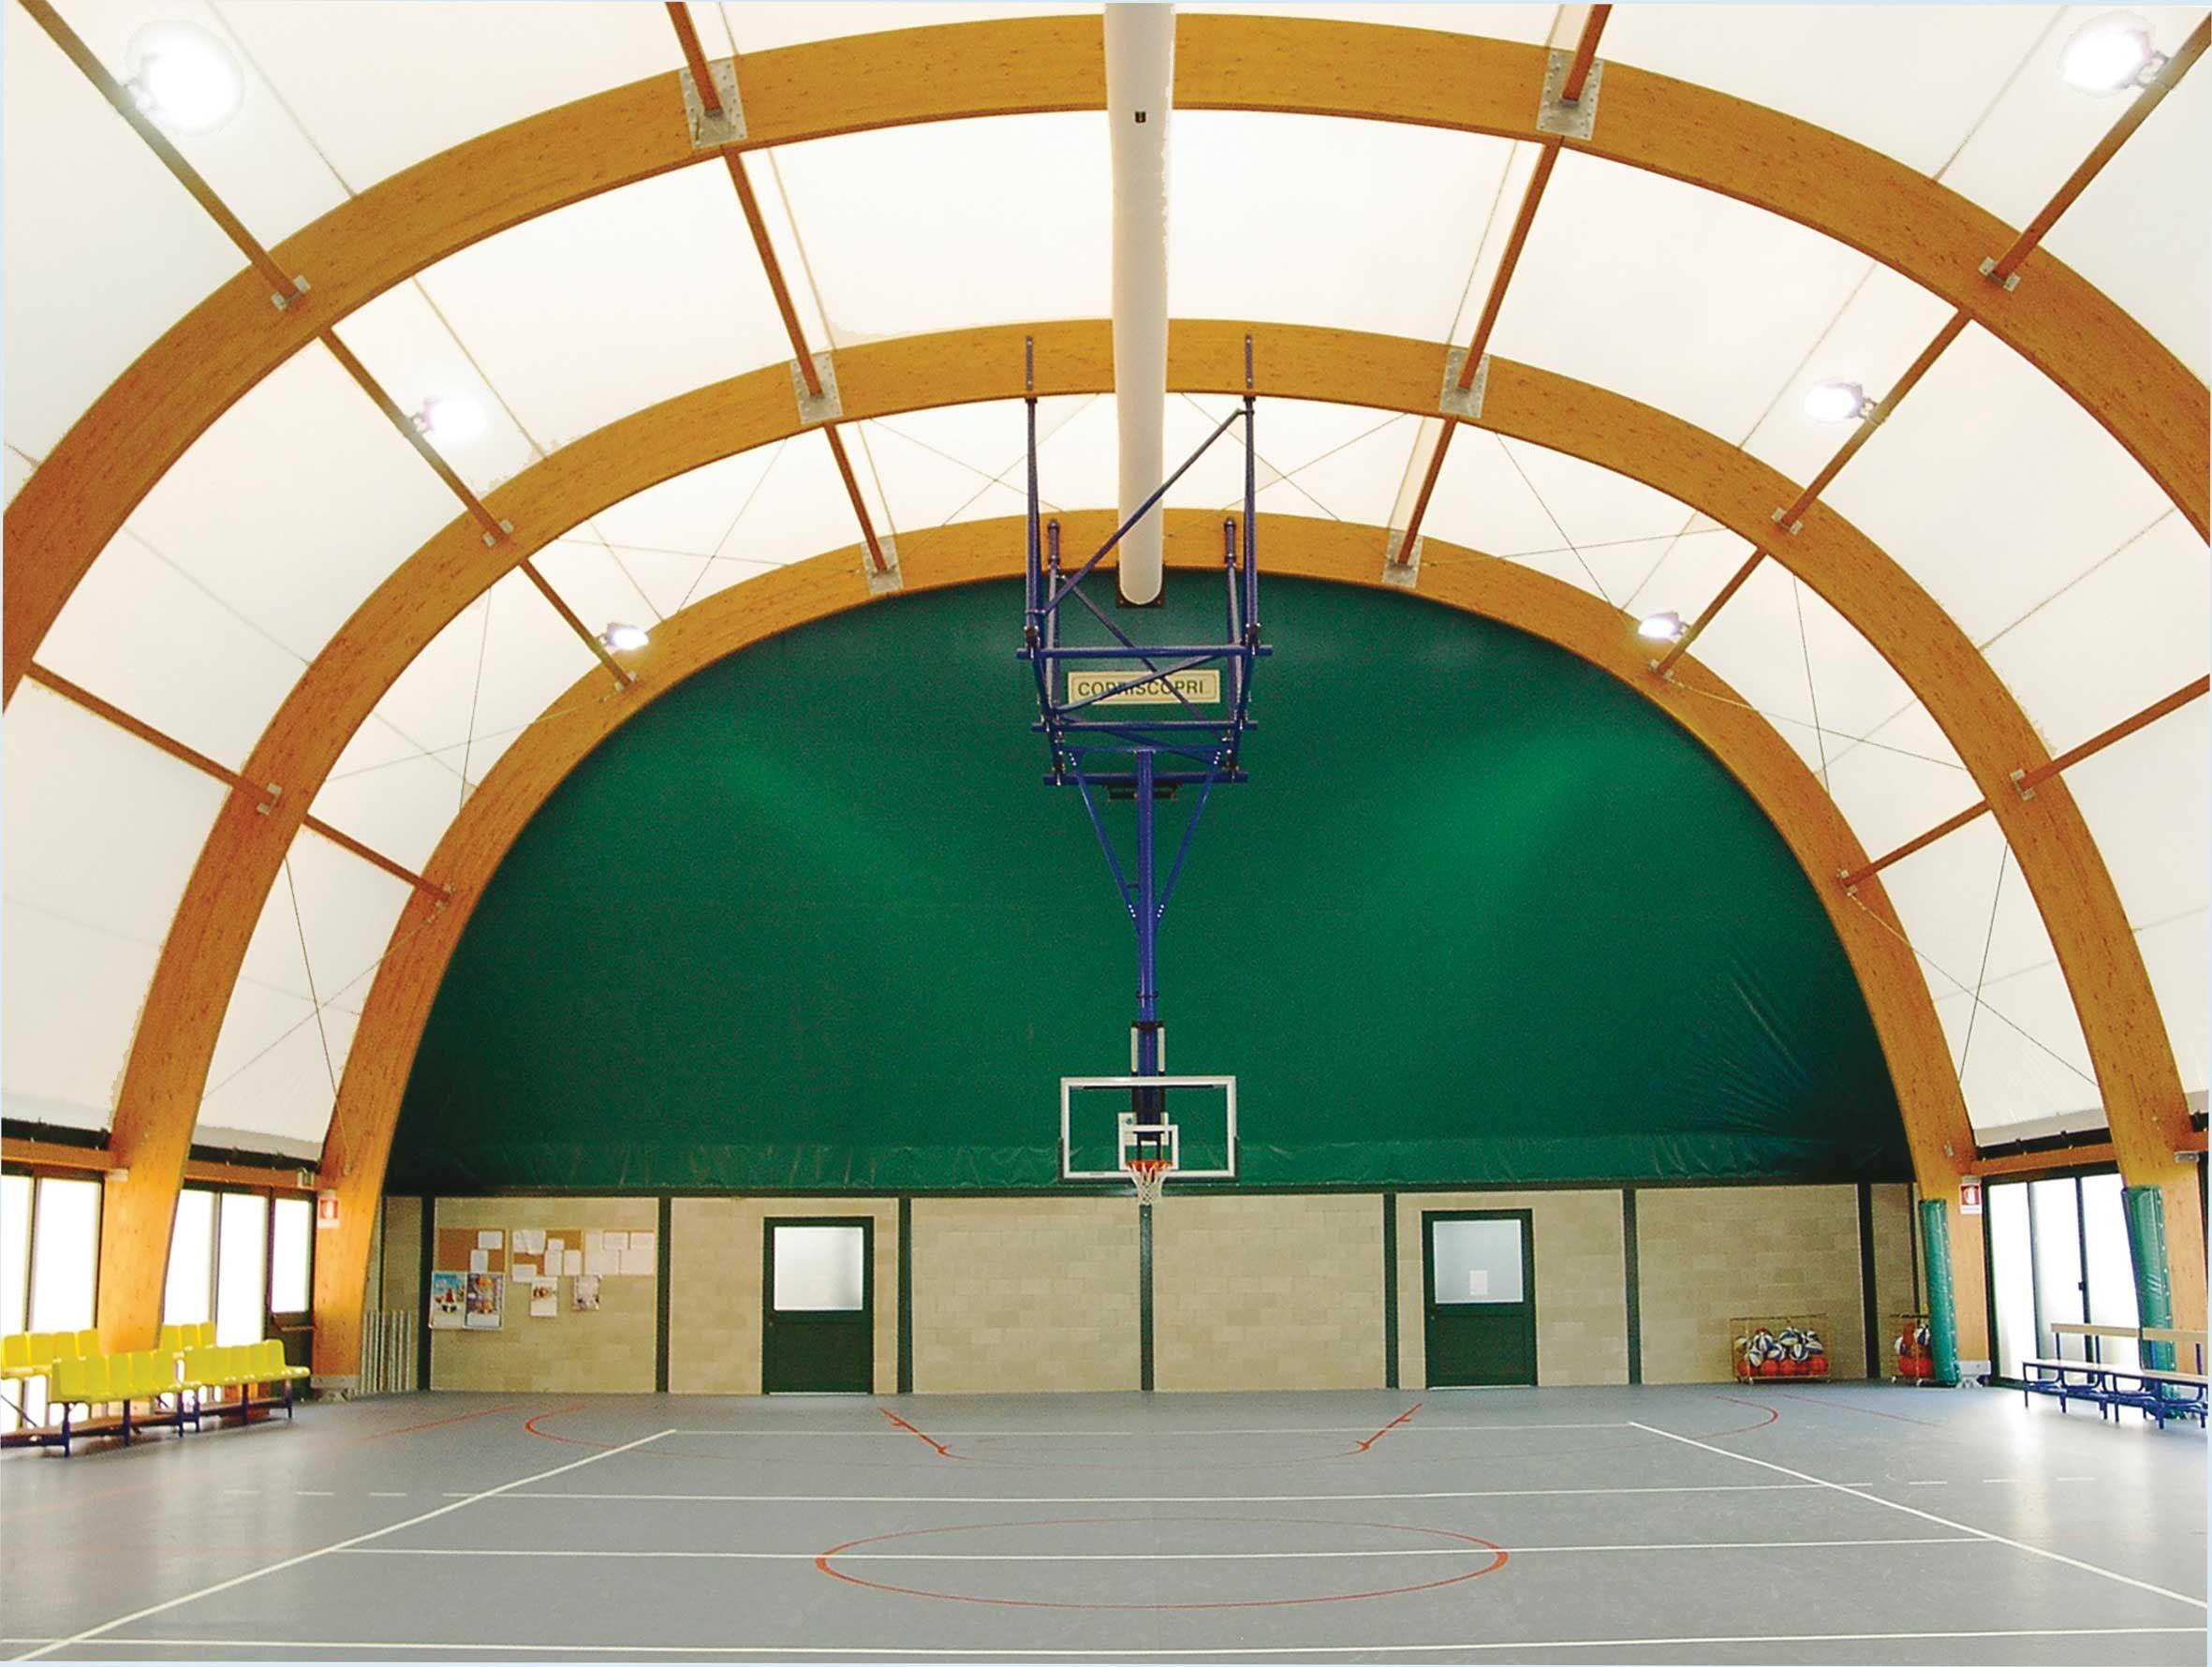 Pin By Hazley Maxwell On Secret Plans Lol In 2020 Indoor Basketball Court Basketball Basketball Court